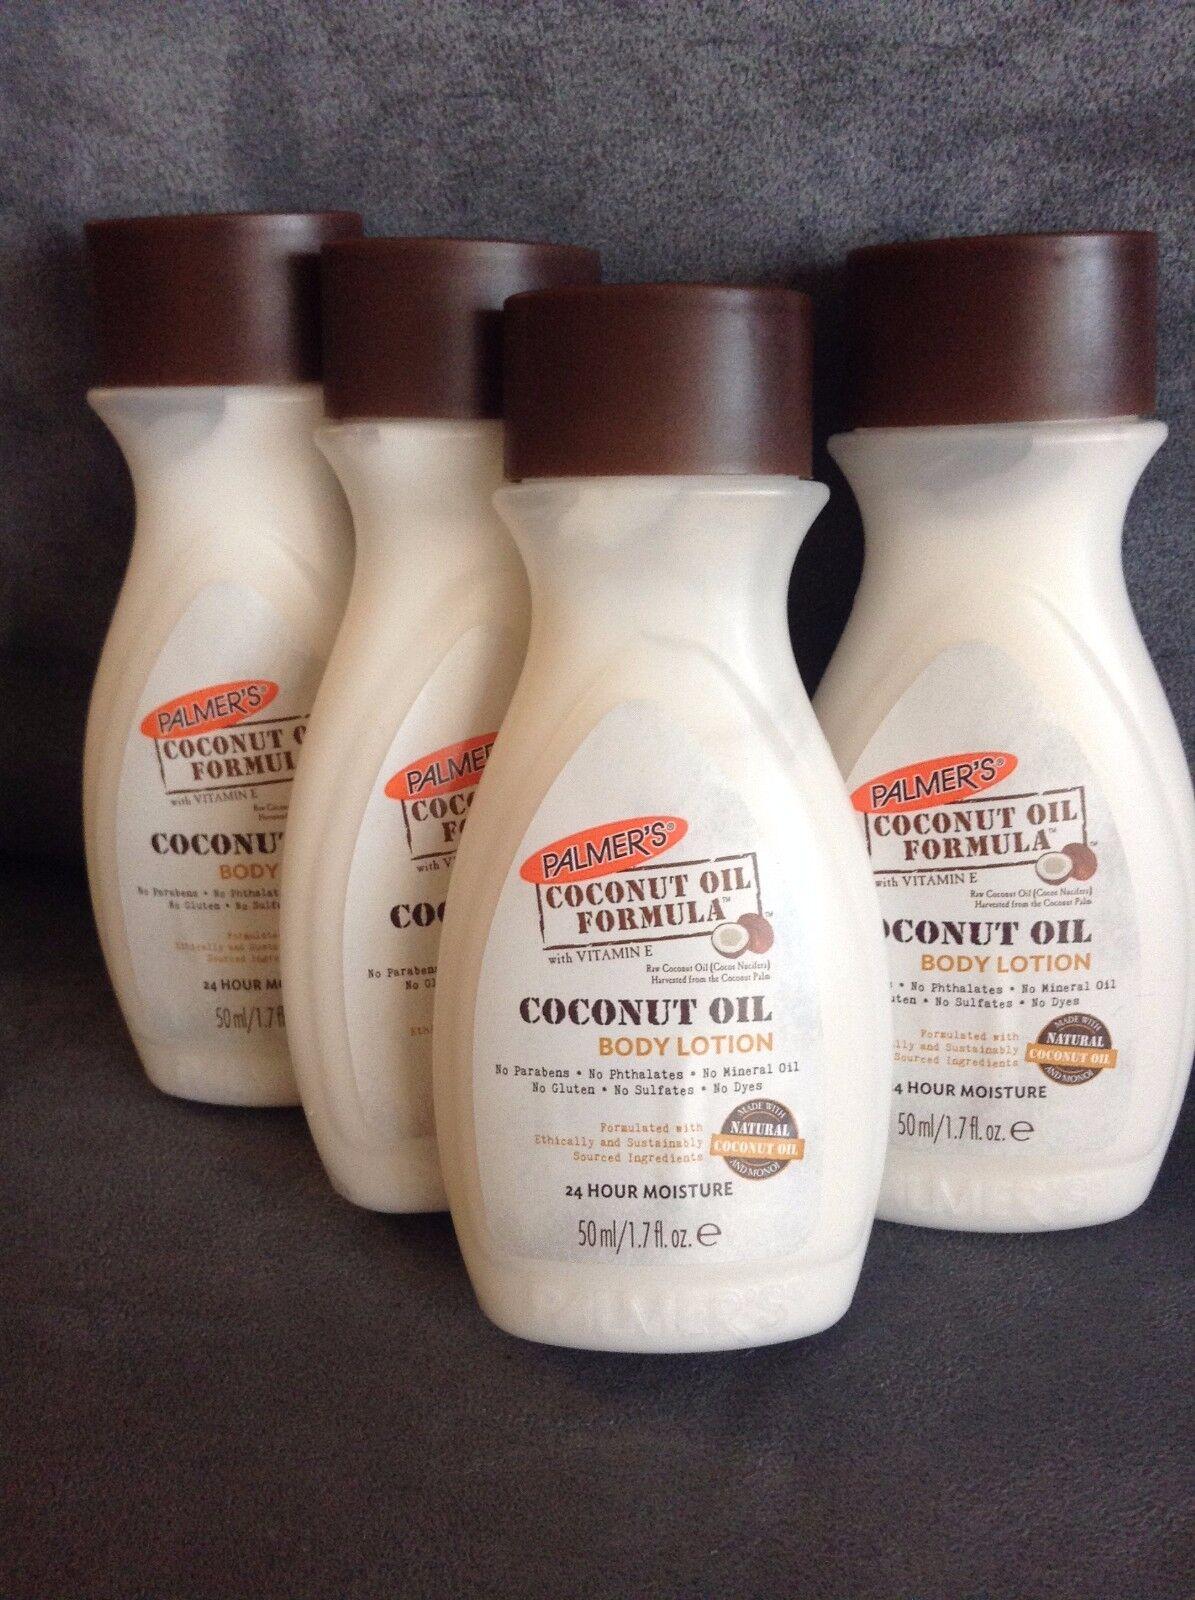 Palmer's Coconut Oil Body Lotion Trial Size 1.7 FL OZ - LOT